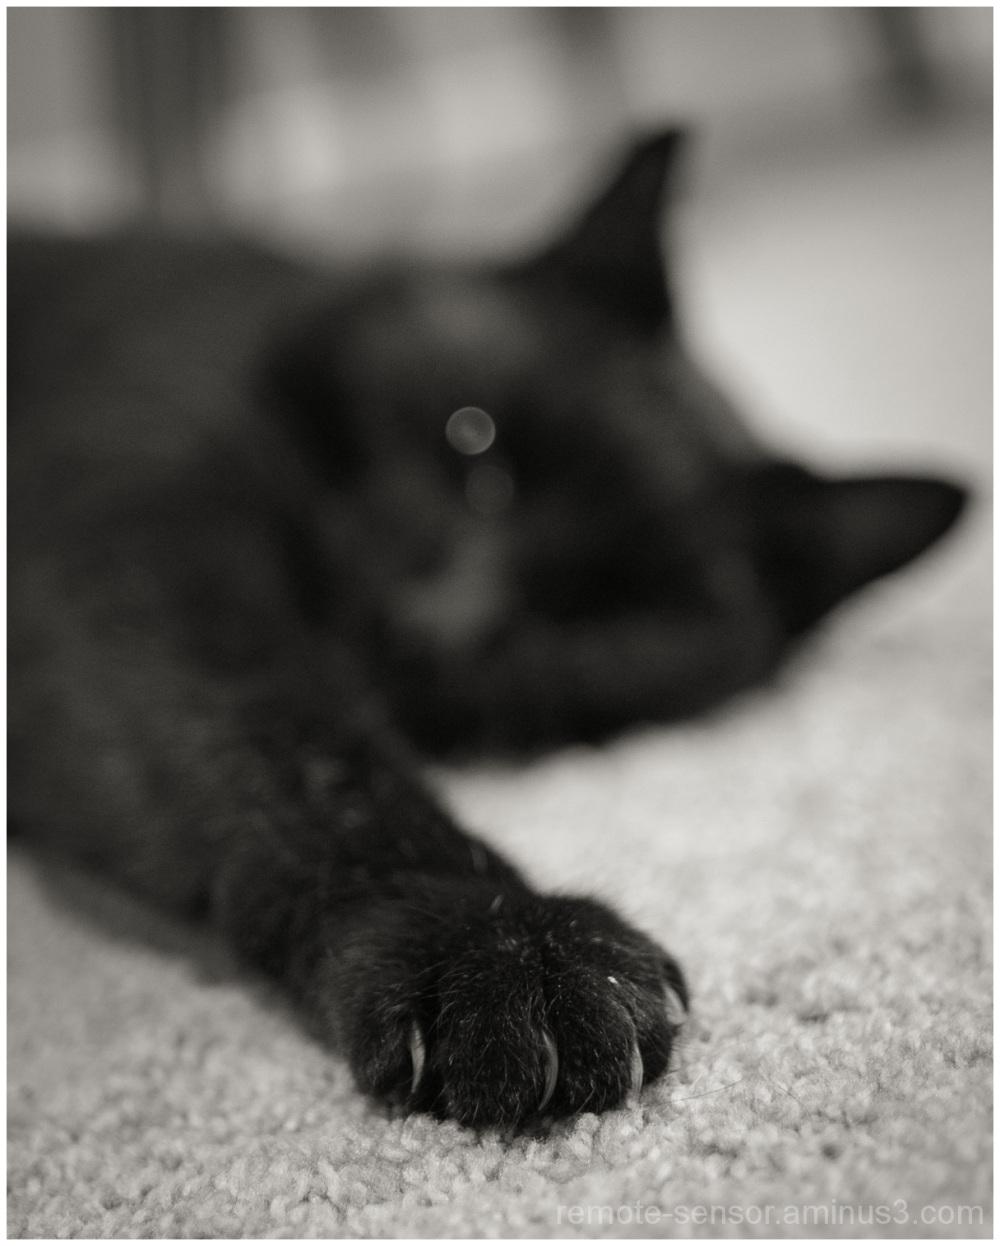 mr pablo the scary black cat